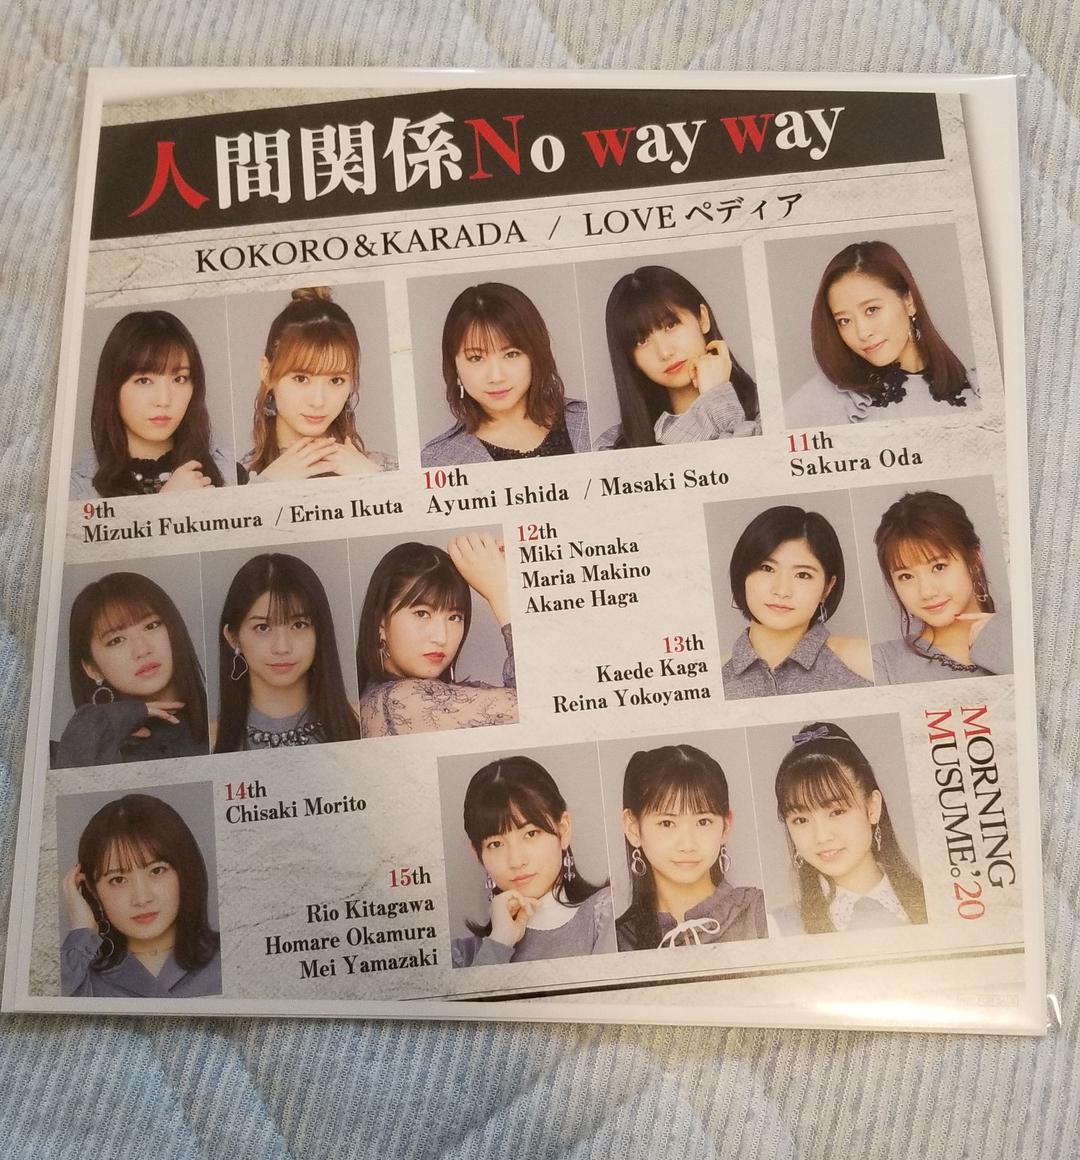 Way way 関係 no 人間